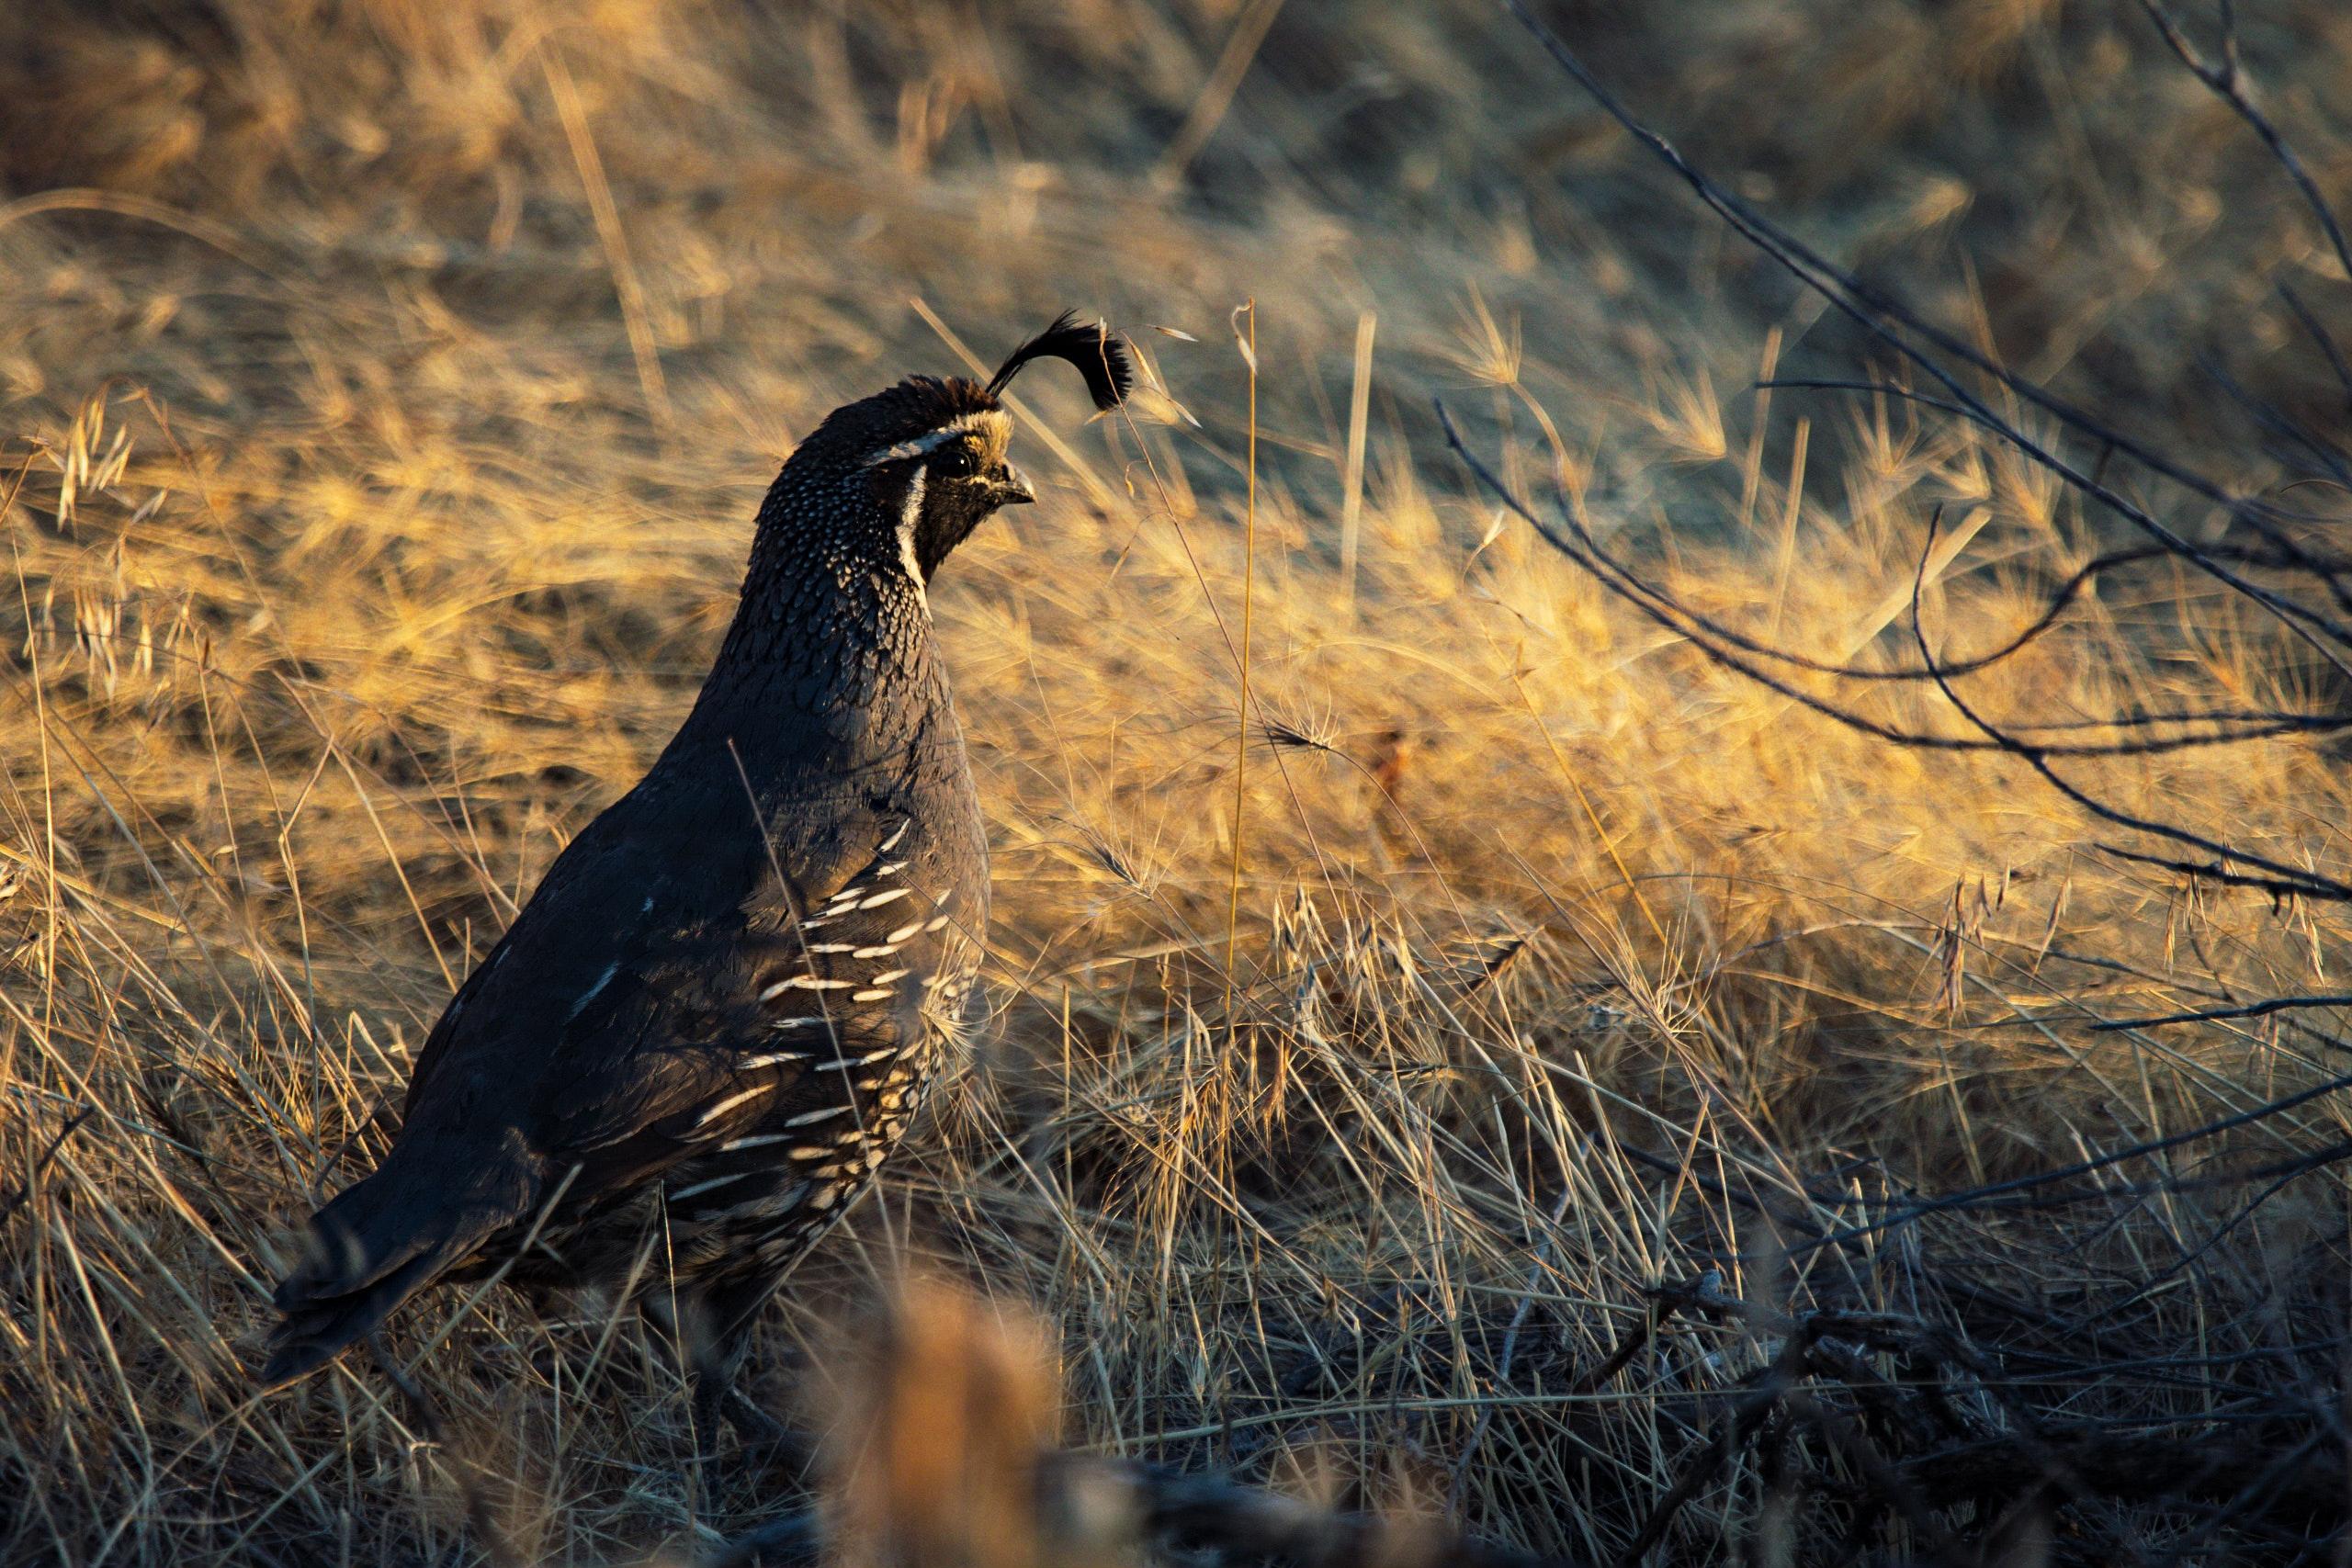 98 Koleksi Gambar Binatang Burung Puyuh HD Terbaik